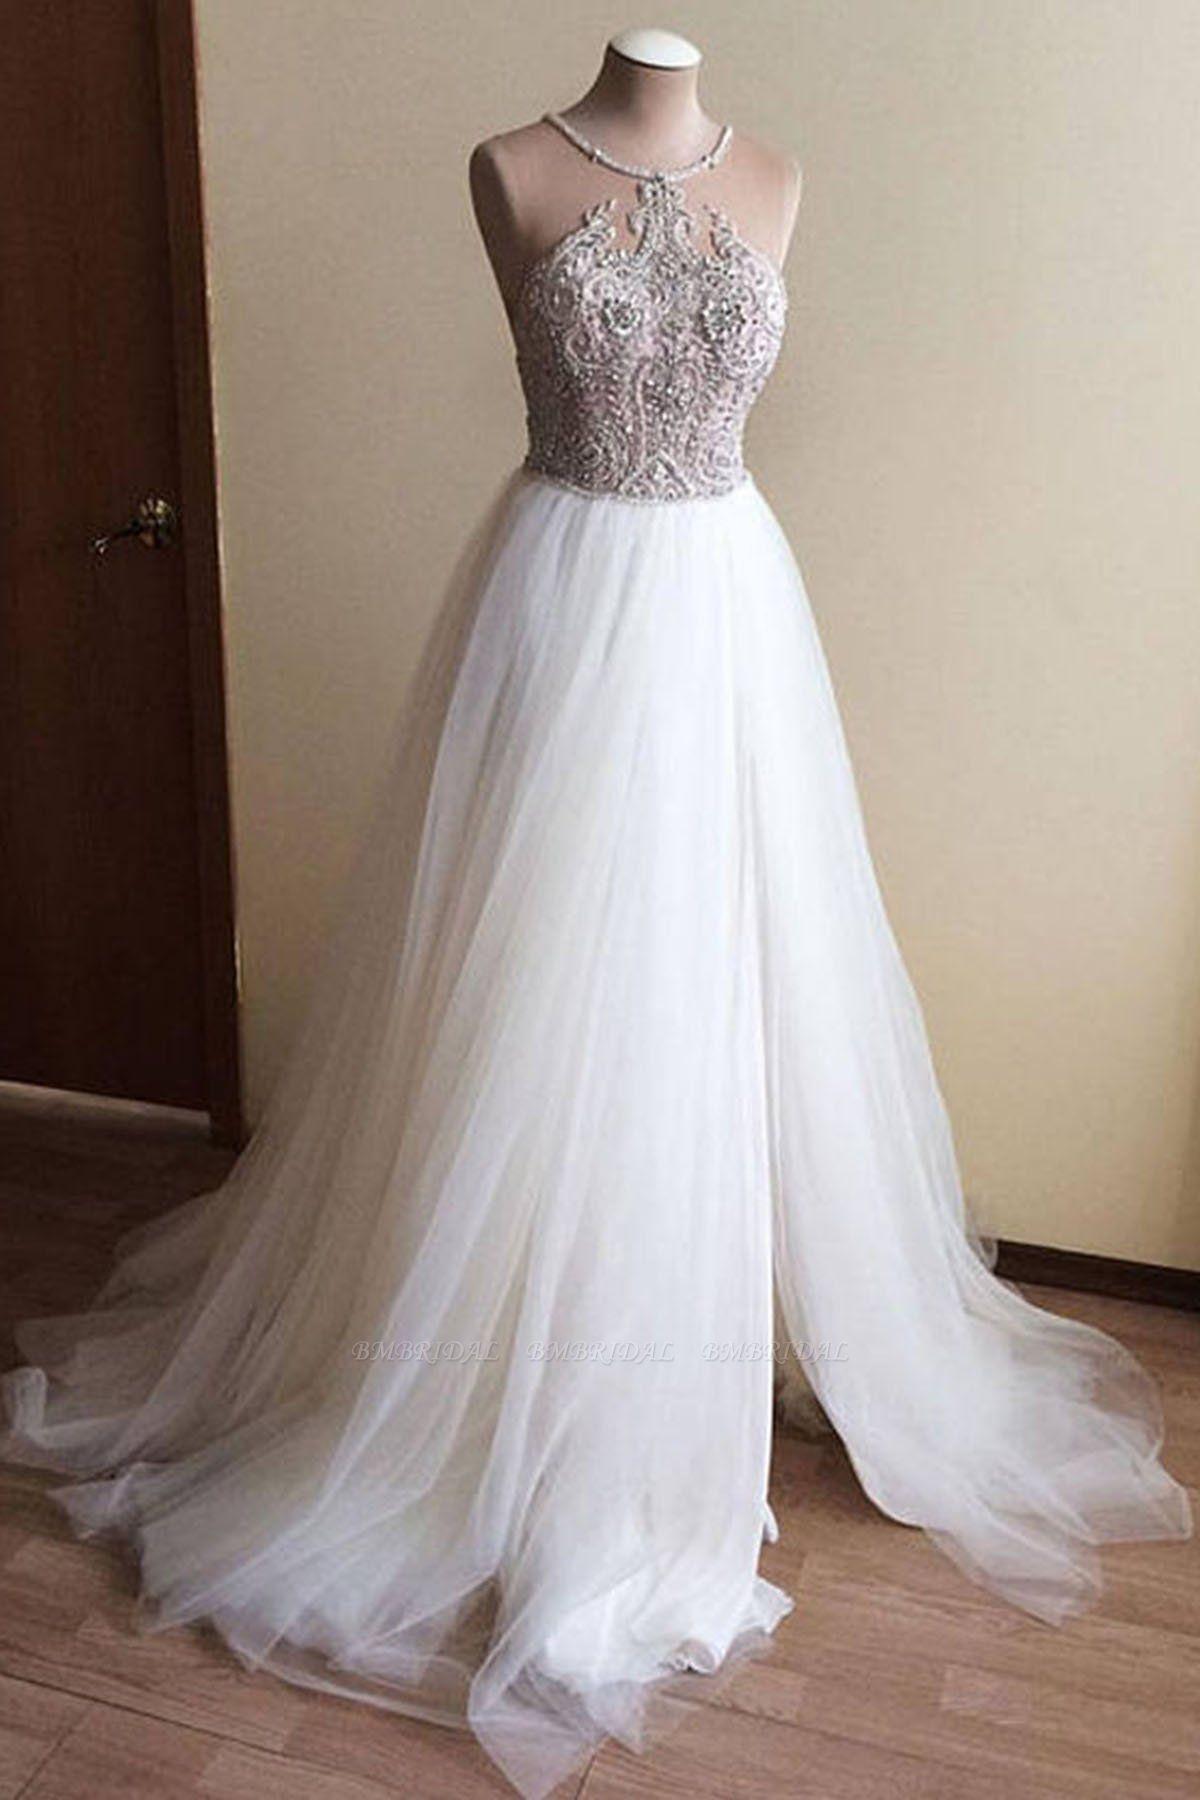 BMbridal Glamorous White Tulle Crystal Beaded Wedding Dress Halter Seeveless Bridal Gowns On Sale